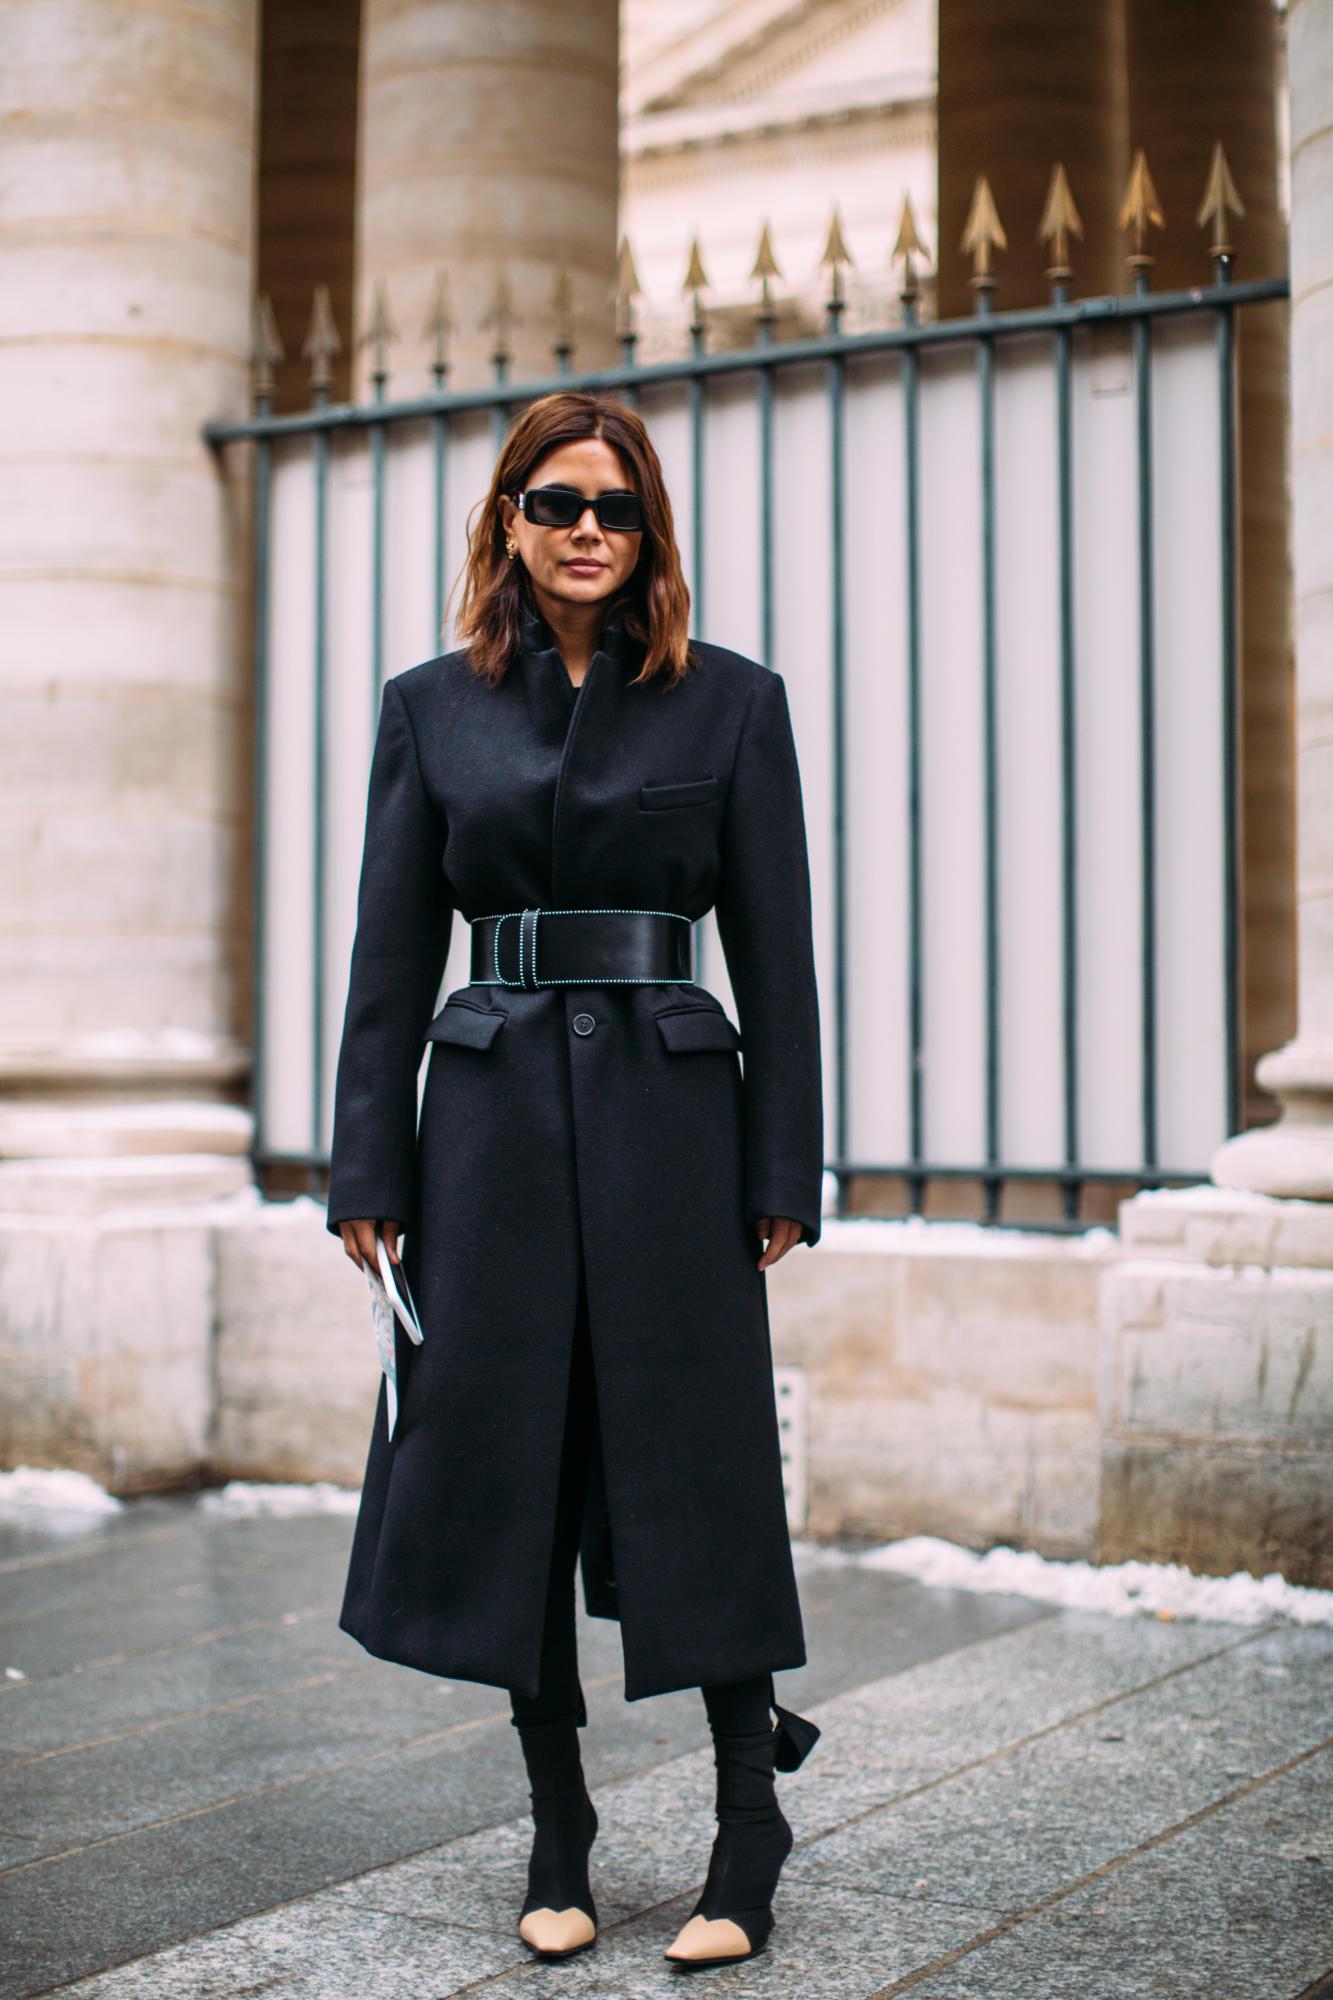 paris-fashion-week-street-style-fall-2018-day-3-59.jpg